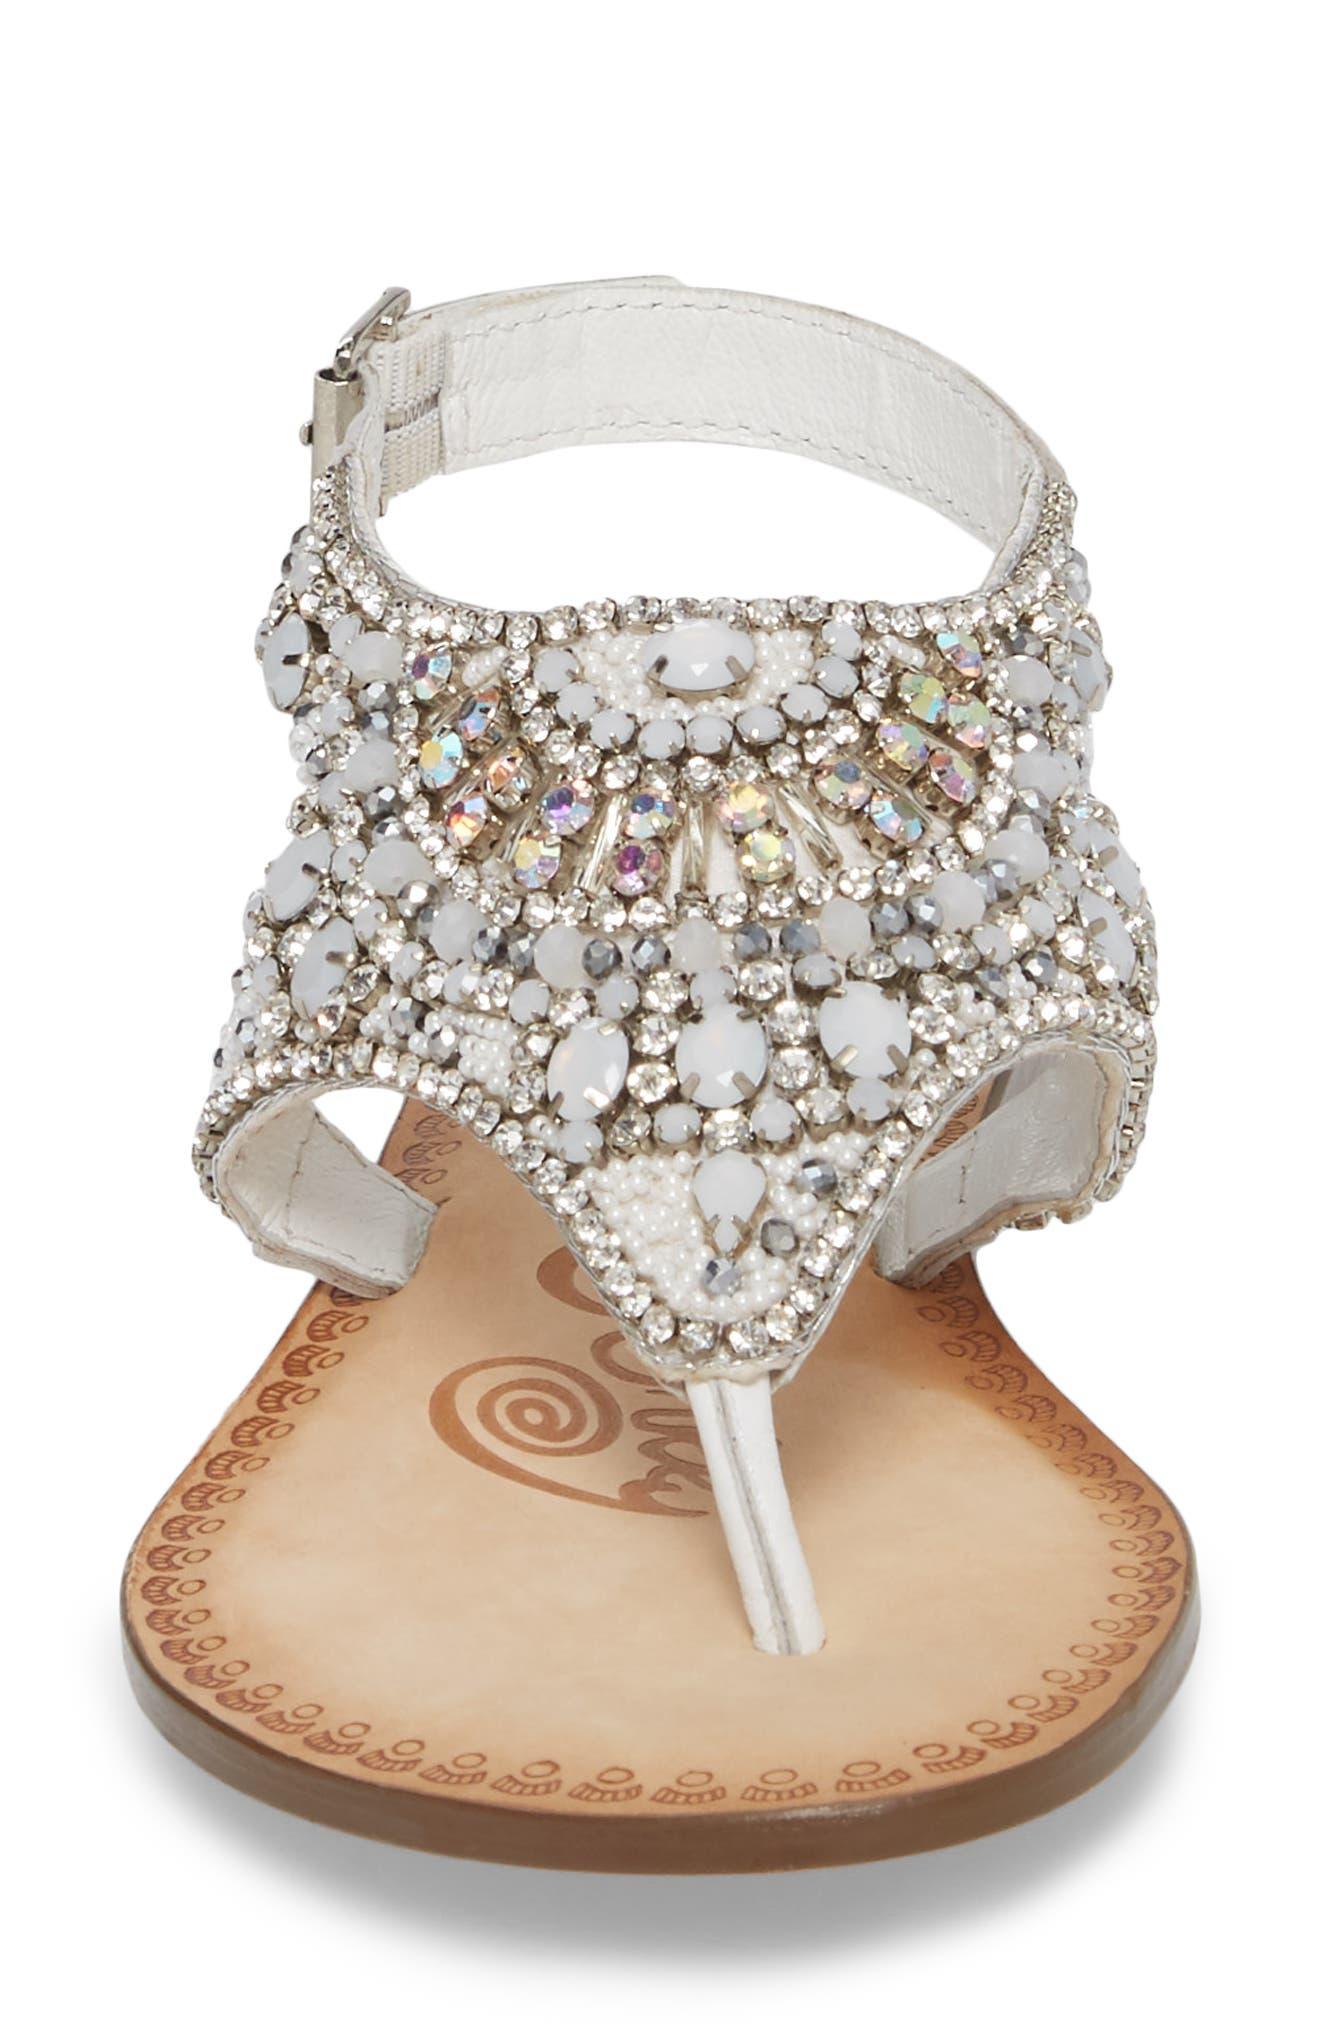 Iceberg Crystal Embellished Sandal,                             Alternate thumbnail 4, color,                             White Leather